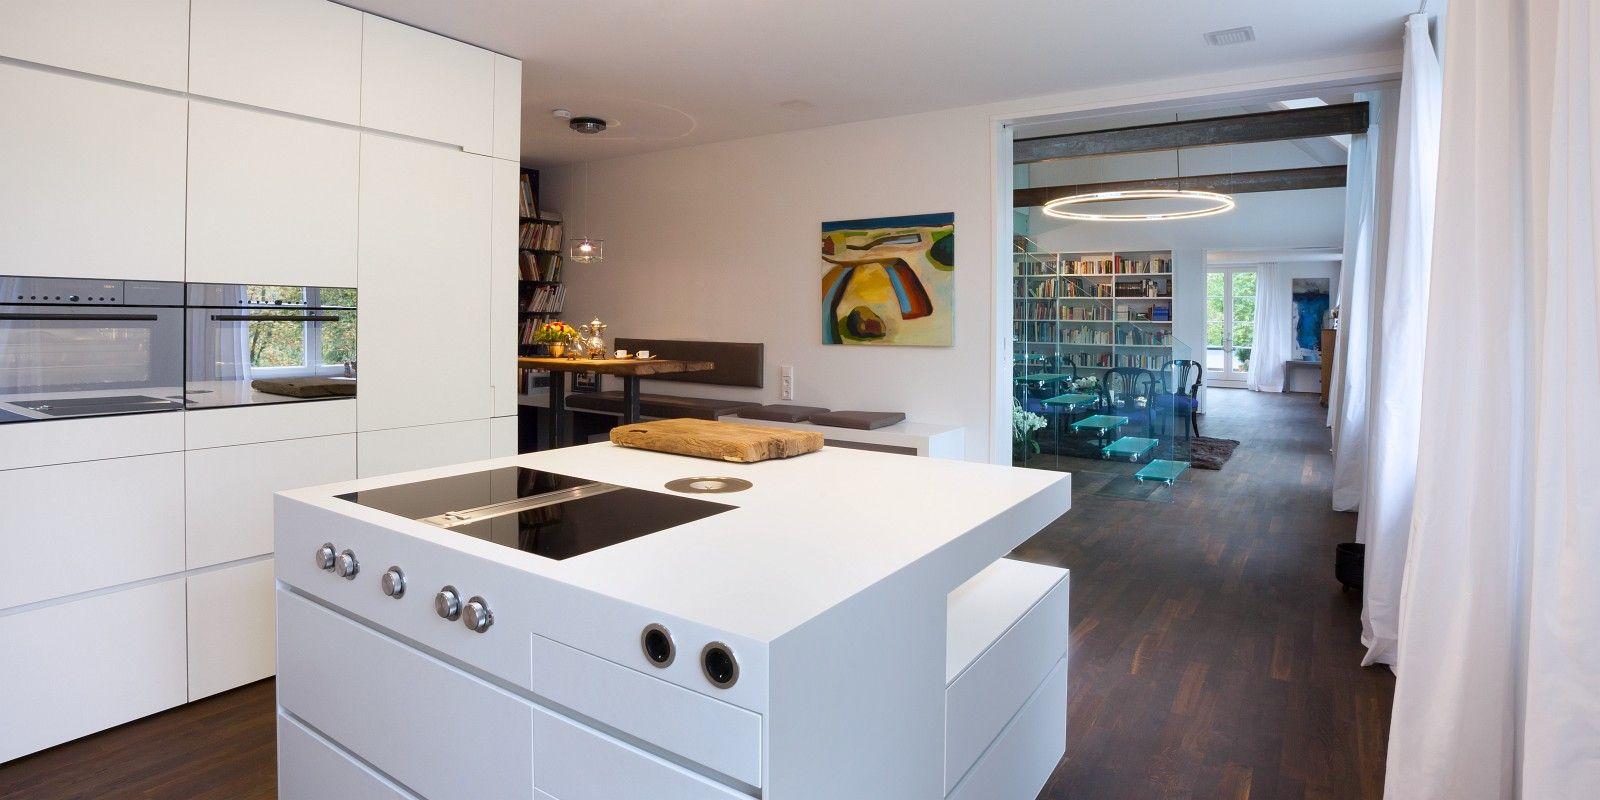 dunstabzug f r kochinsel ikea dunstabzugshaube rohr. Black Bedroom Furniture Sets. Home Design Ideas